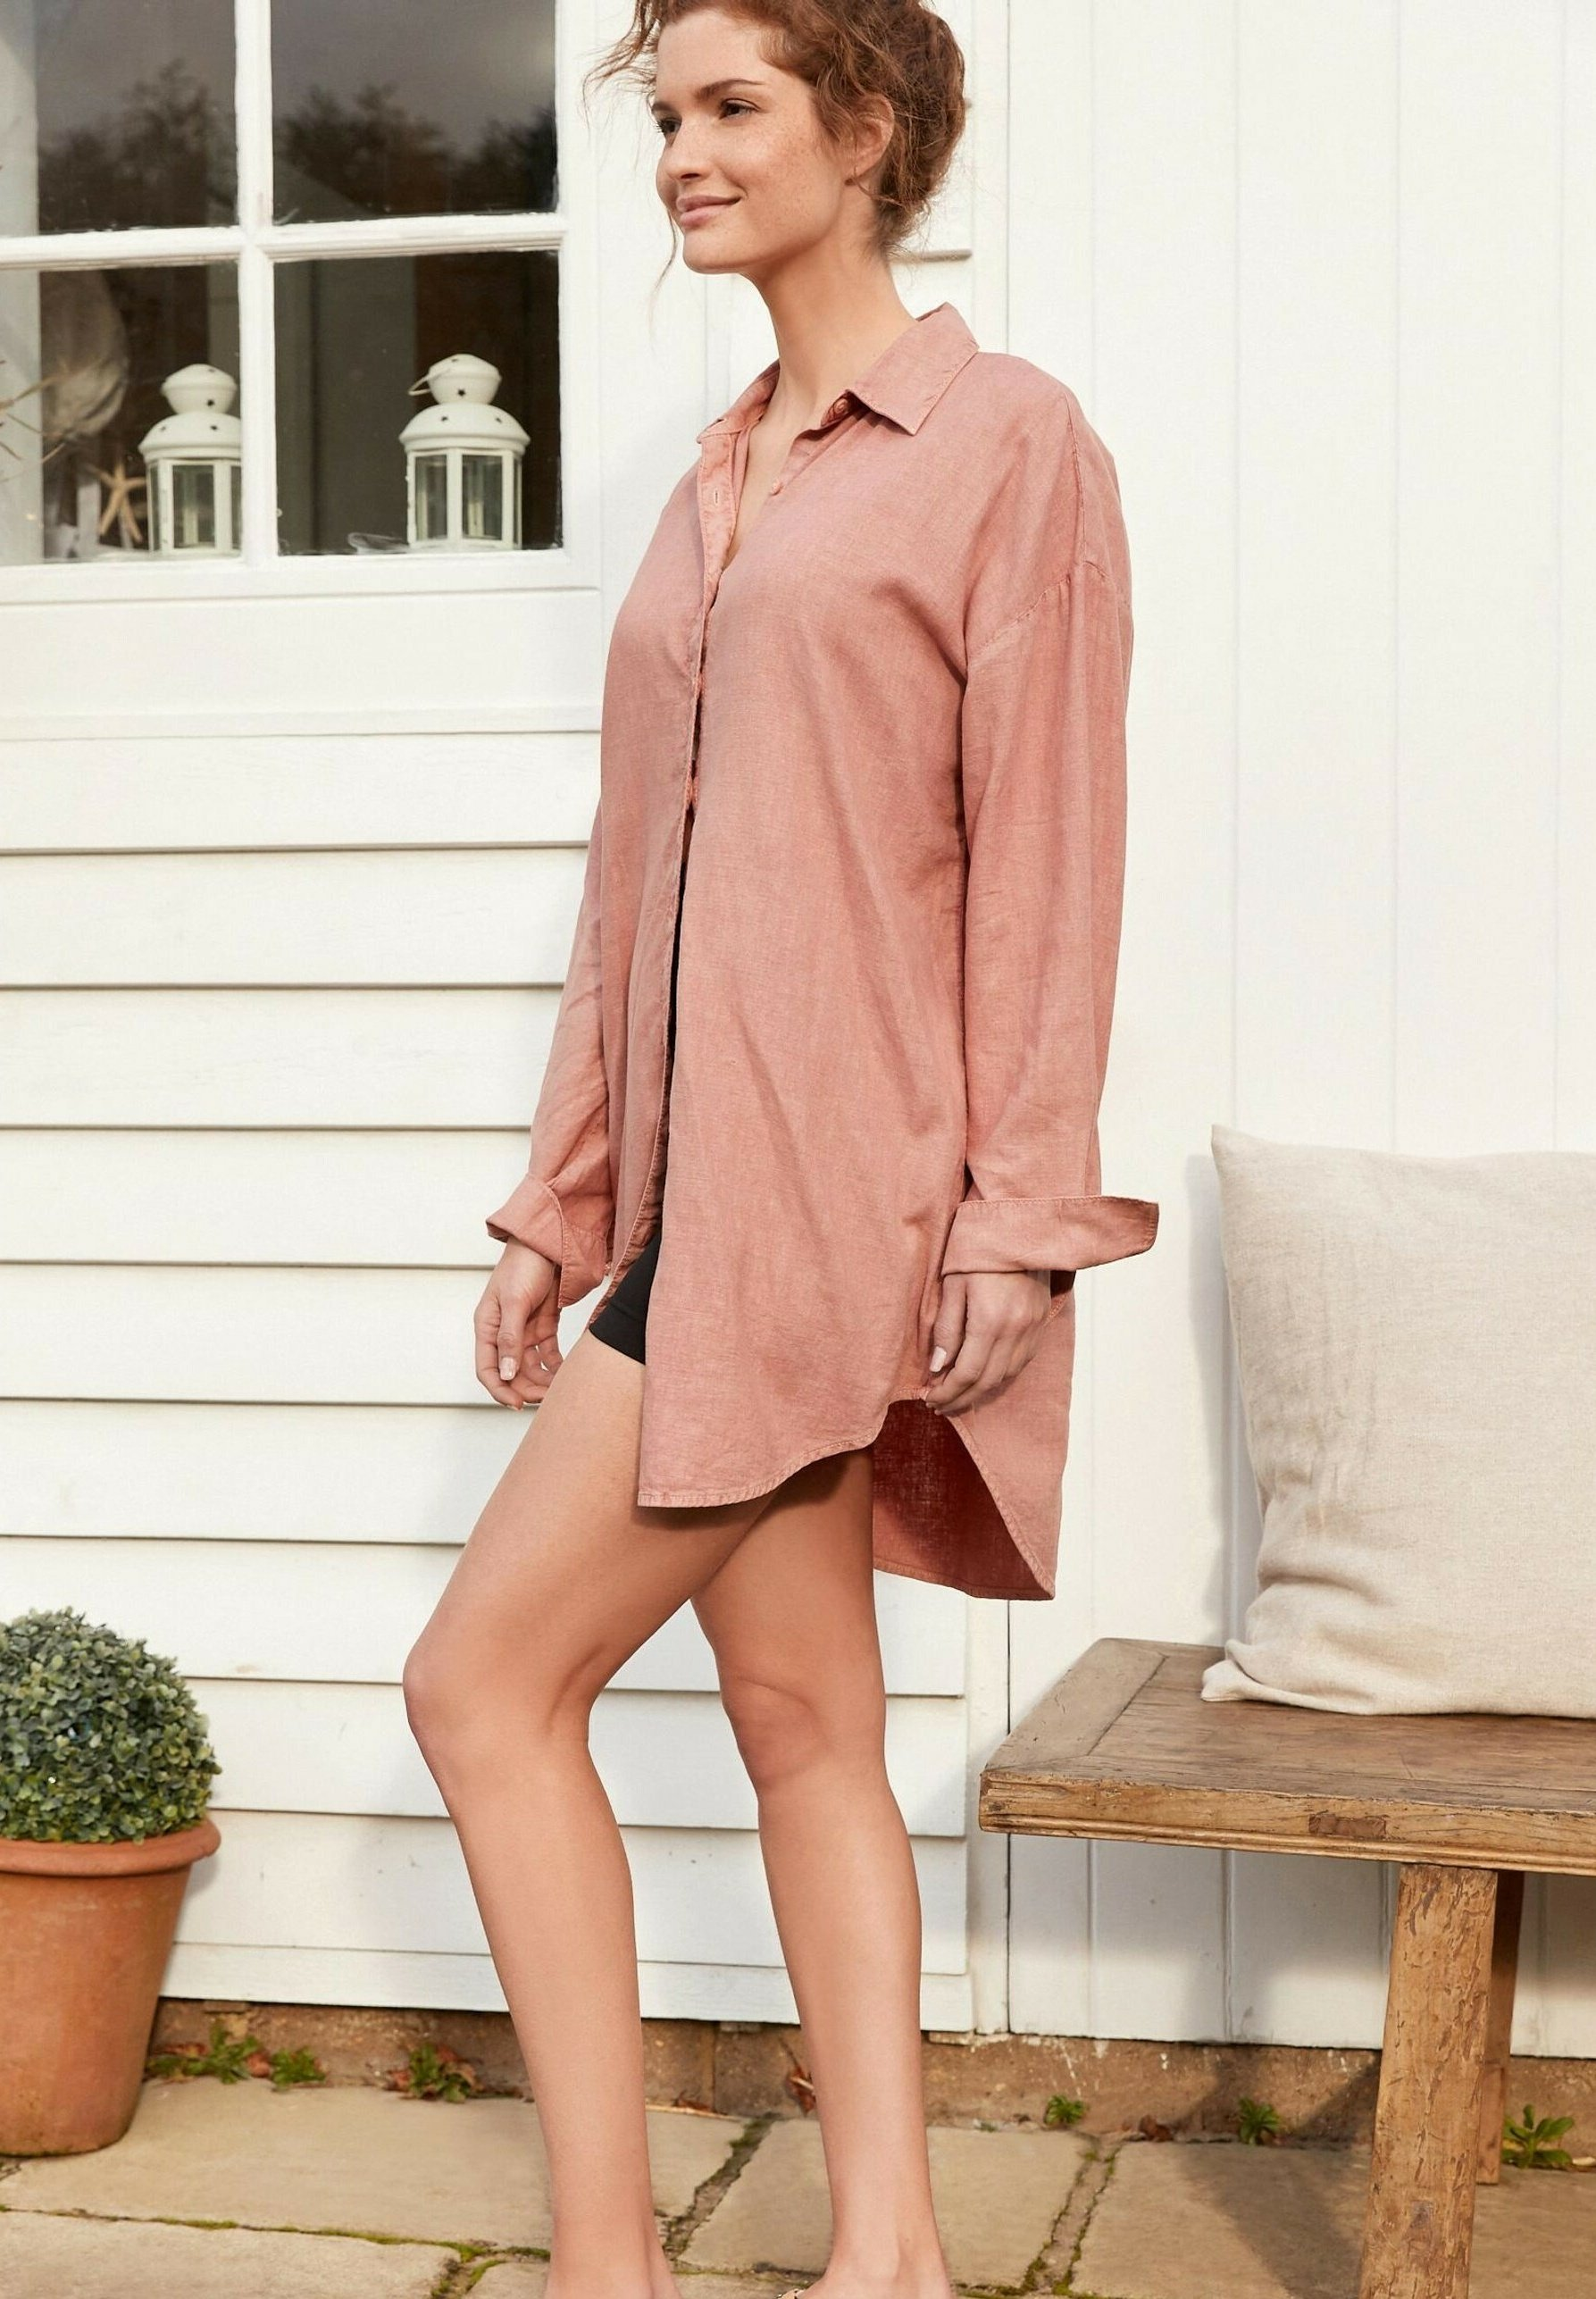 Damen OVERSIZED RICH  - Nachtwäsche Shirt